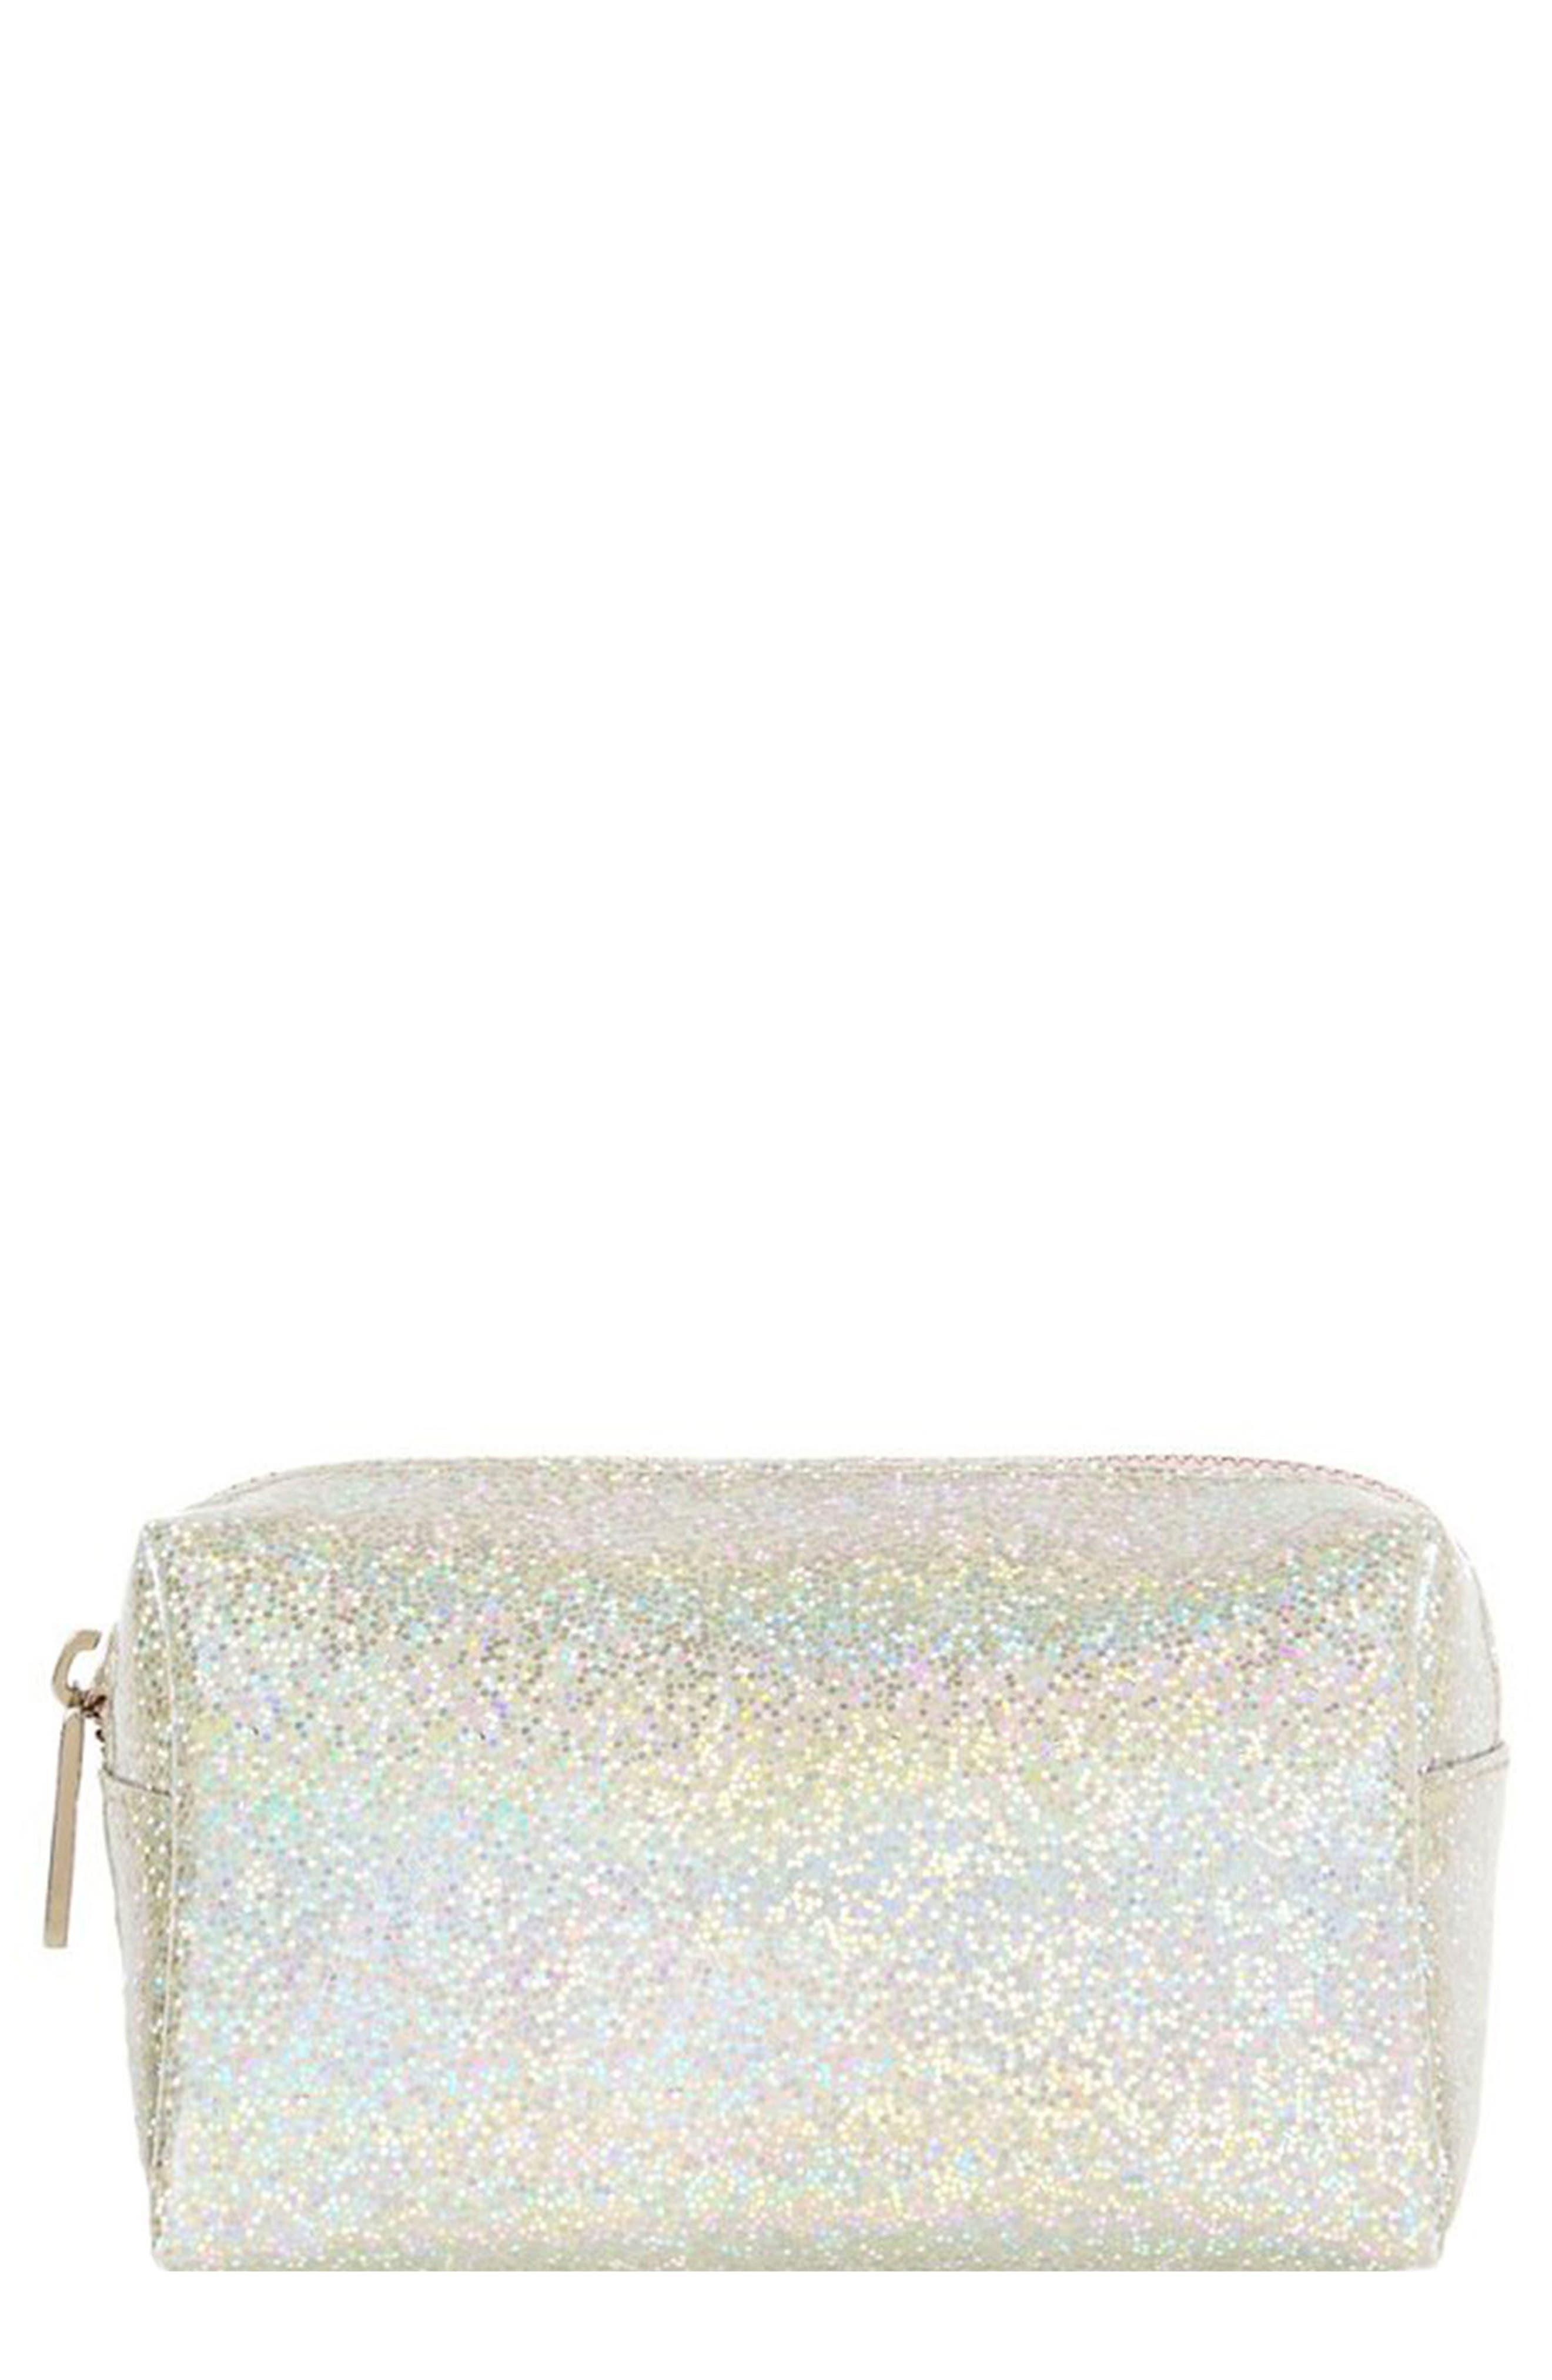 Skinny Dip Disco Makeup Bag,                         Main,                         color, NO COLOR